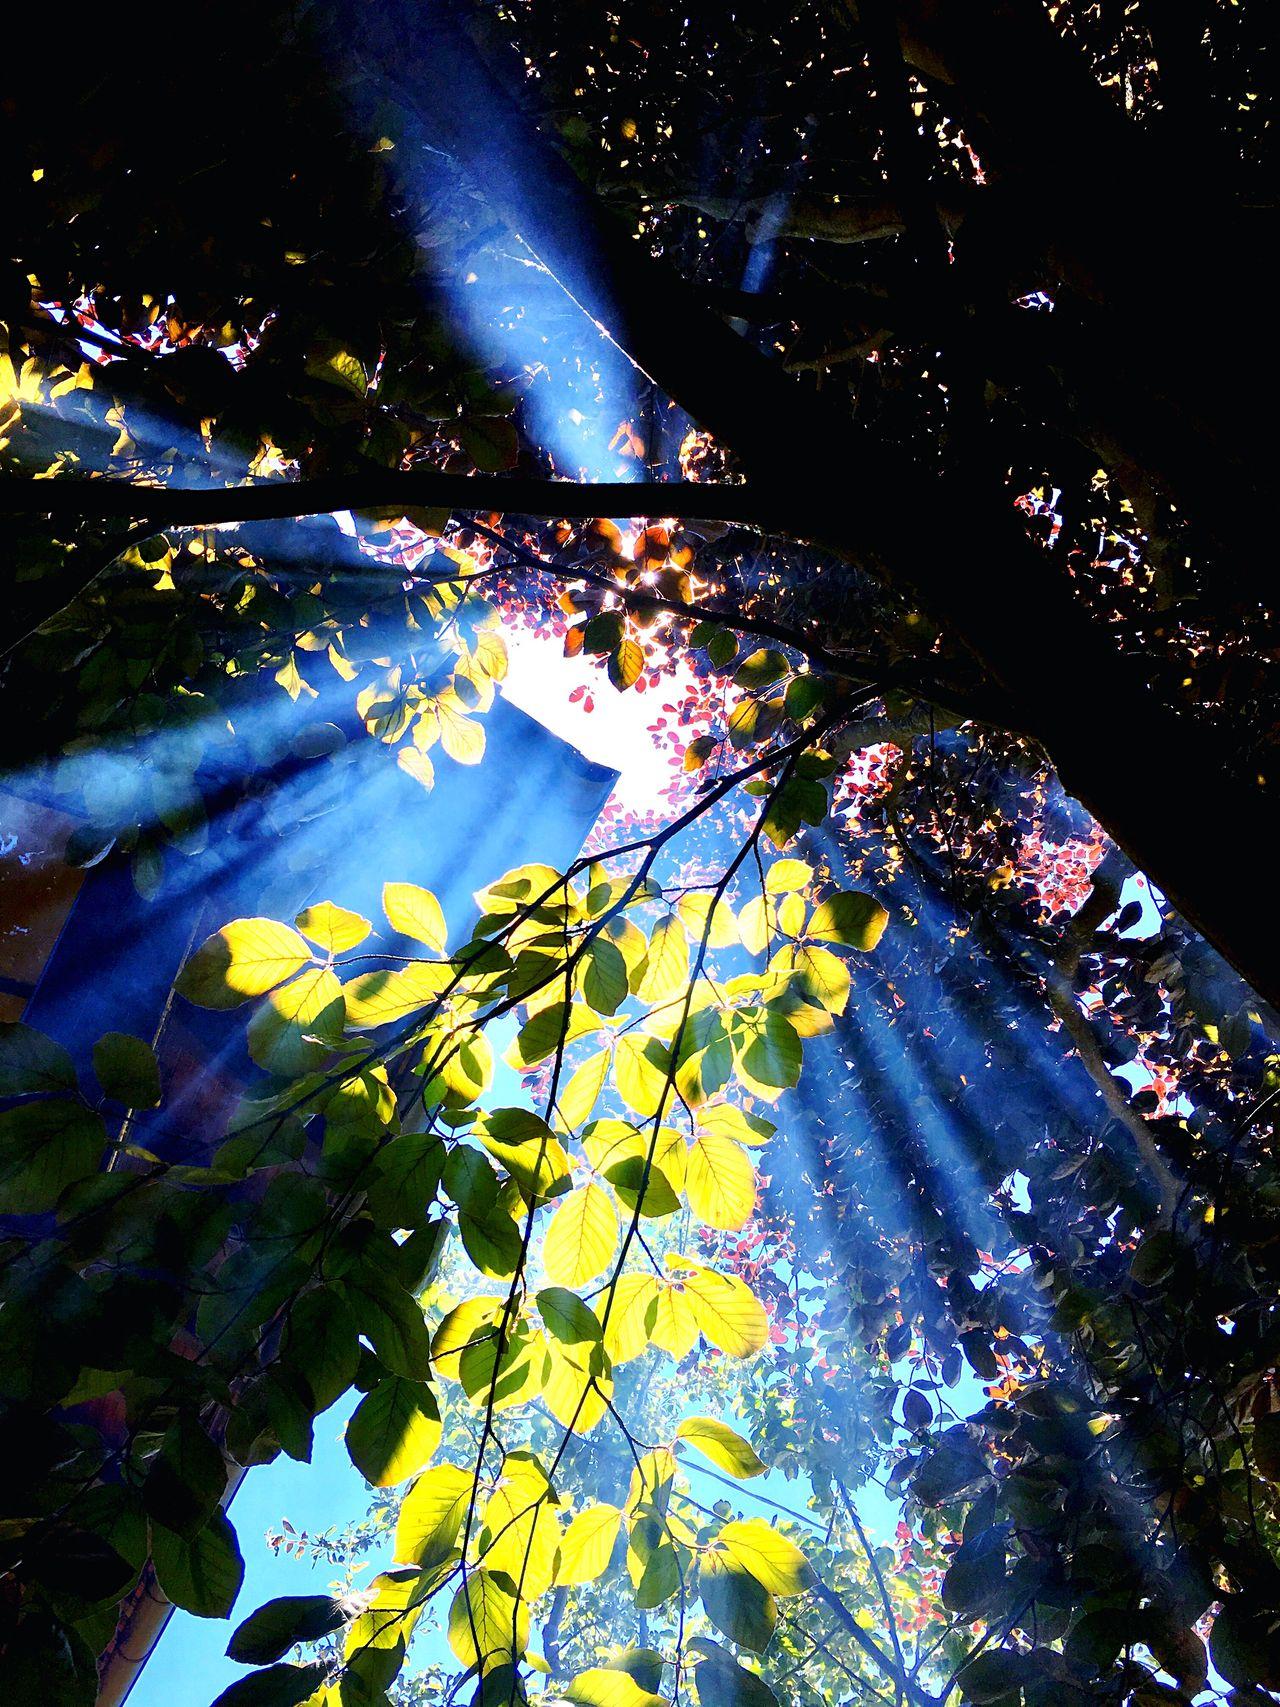 Beauty In Nature Nature Smoke Outdoors Tree No People Flower Branch Sky Sun Tranquil Scene Eyeemphotography IPhoneography EyEmNewHere Eyeem Market EyeEm Gallery Eyemphotography EyeEm Best Shots The Week On Eyem Sunlight Nature EyeEmNewHere Eyem Best Shot - My World